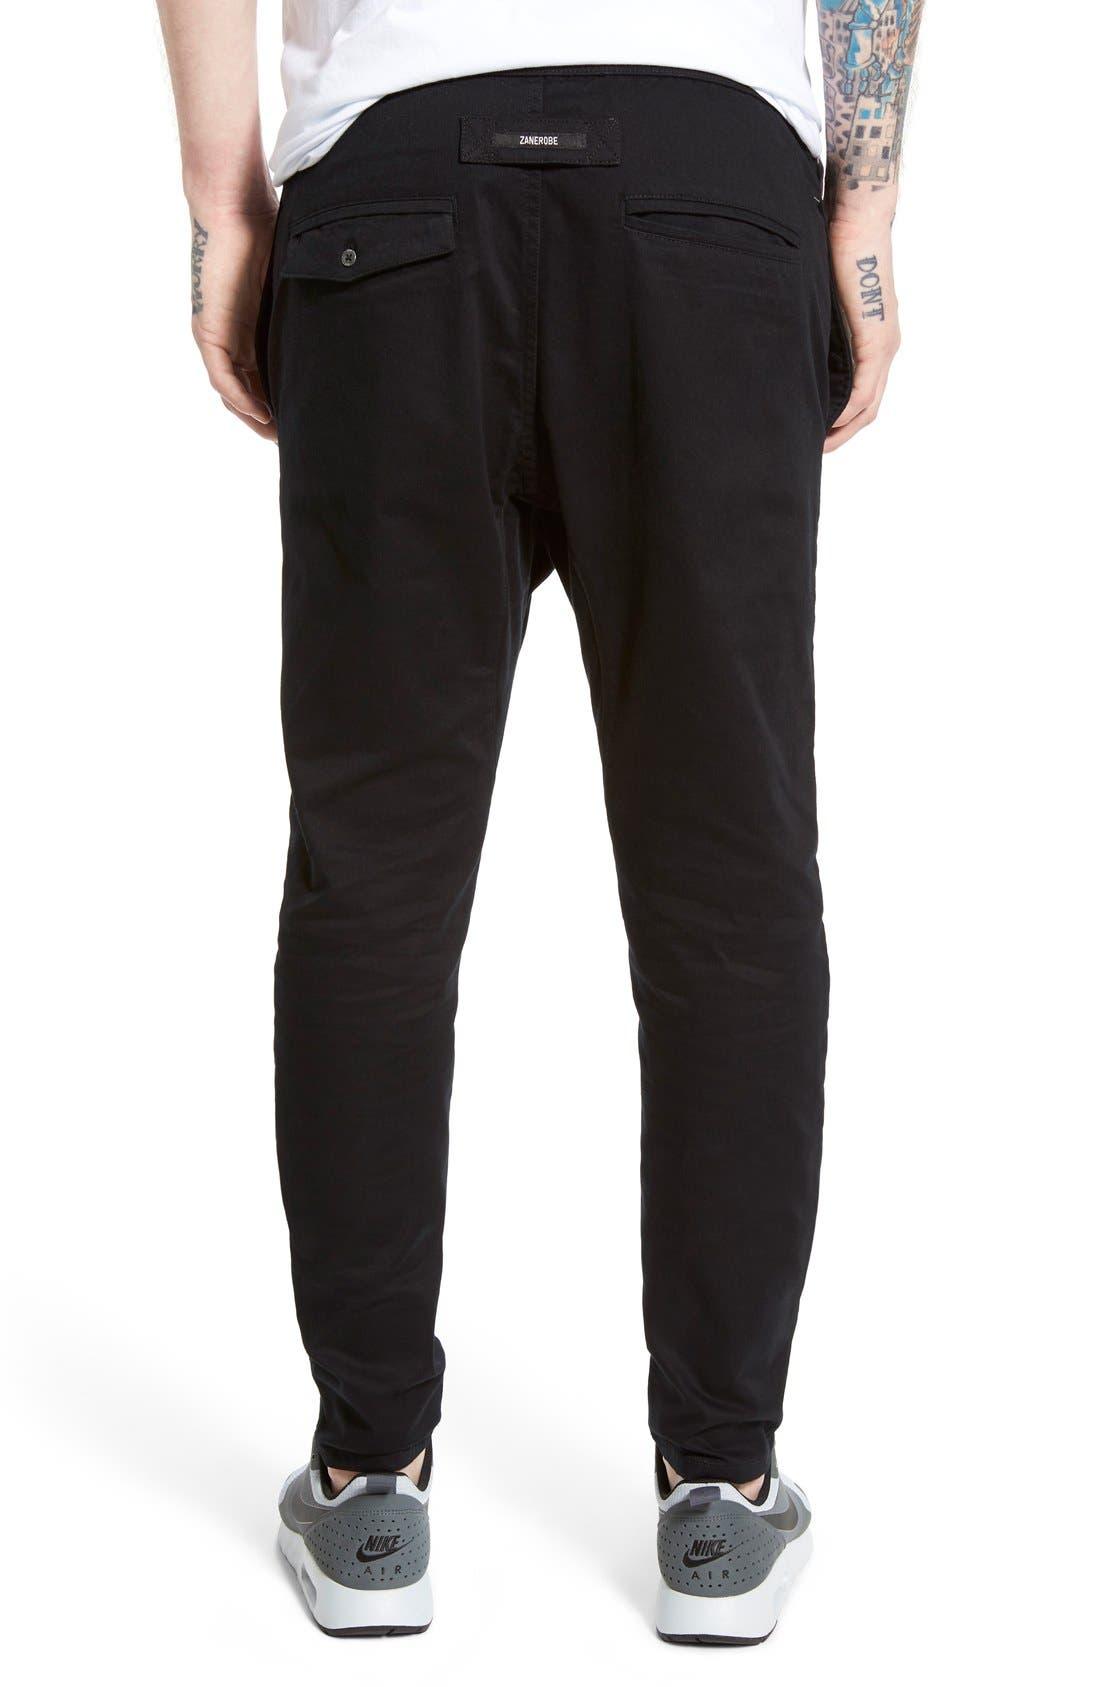 ZANEROBE, Salerno Stretch Woven Jogger Pants, Alternate thumbnail 3, color, BLACK